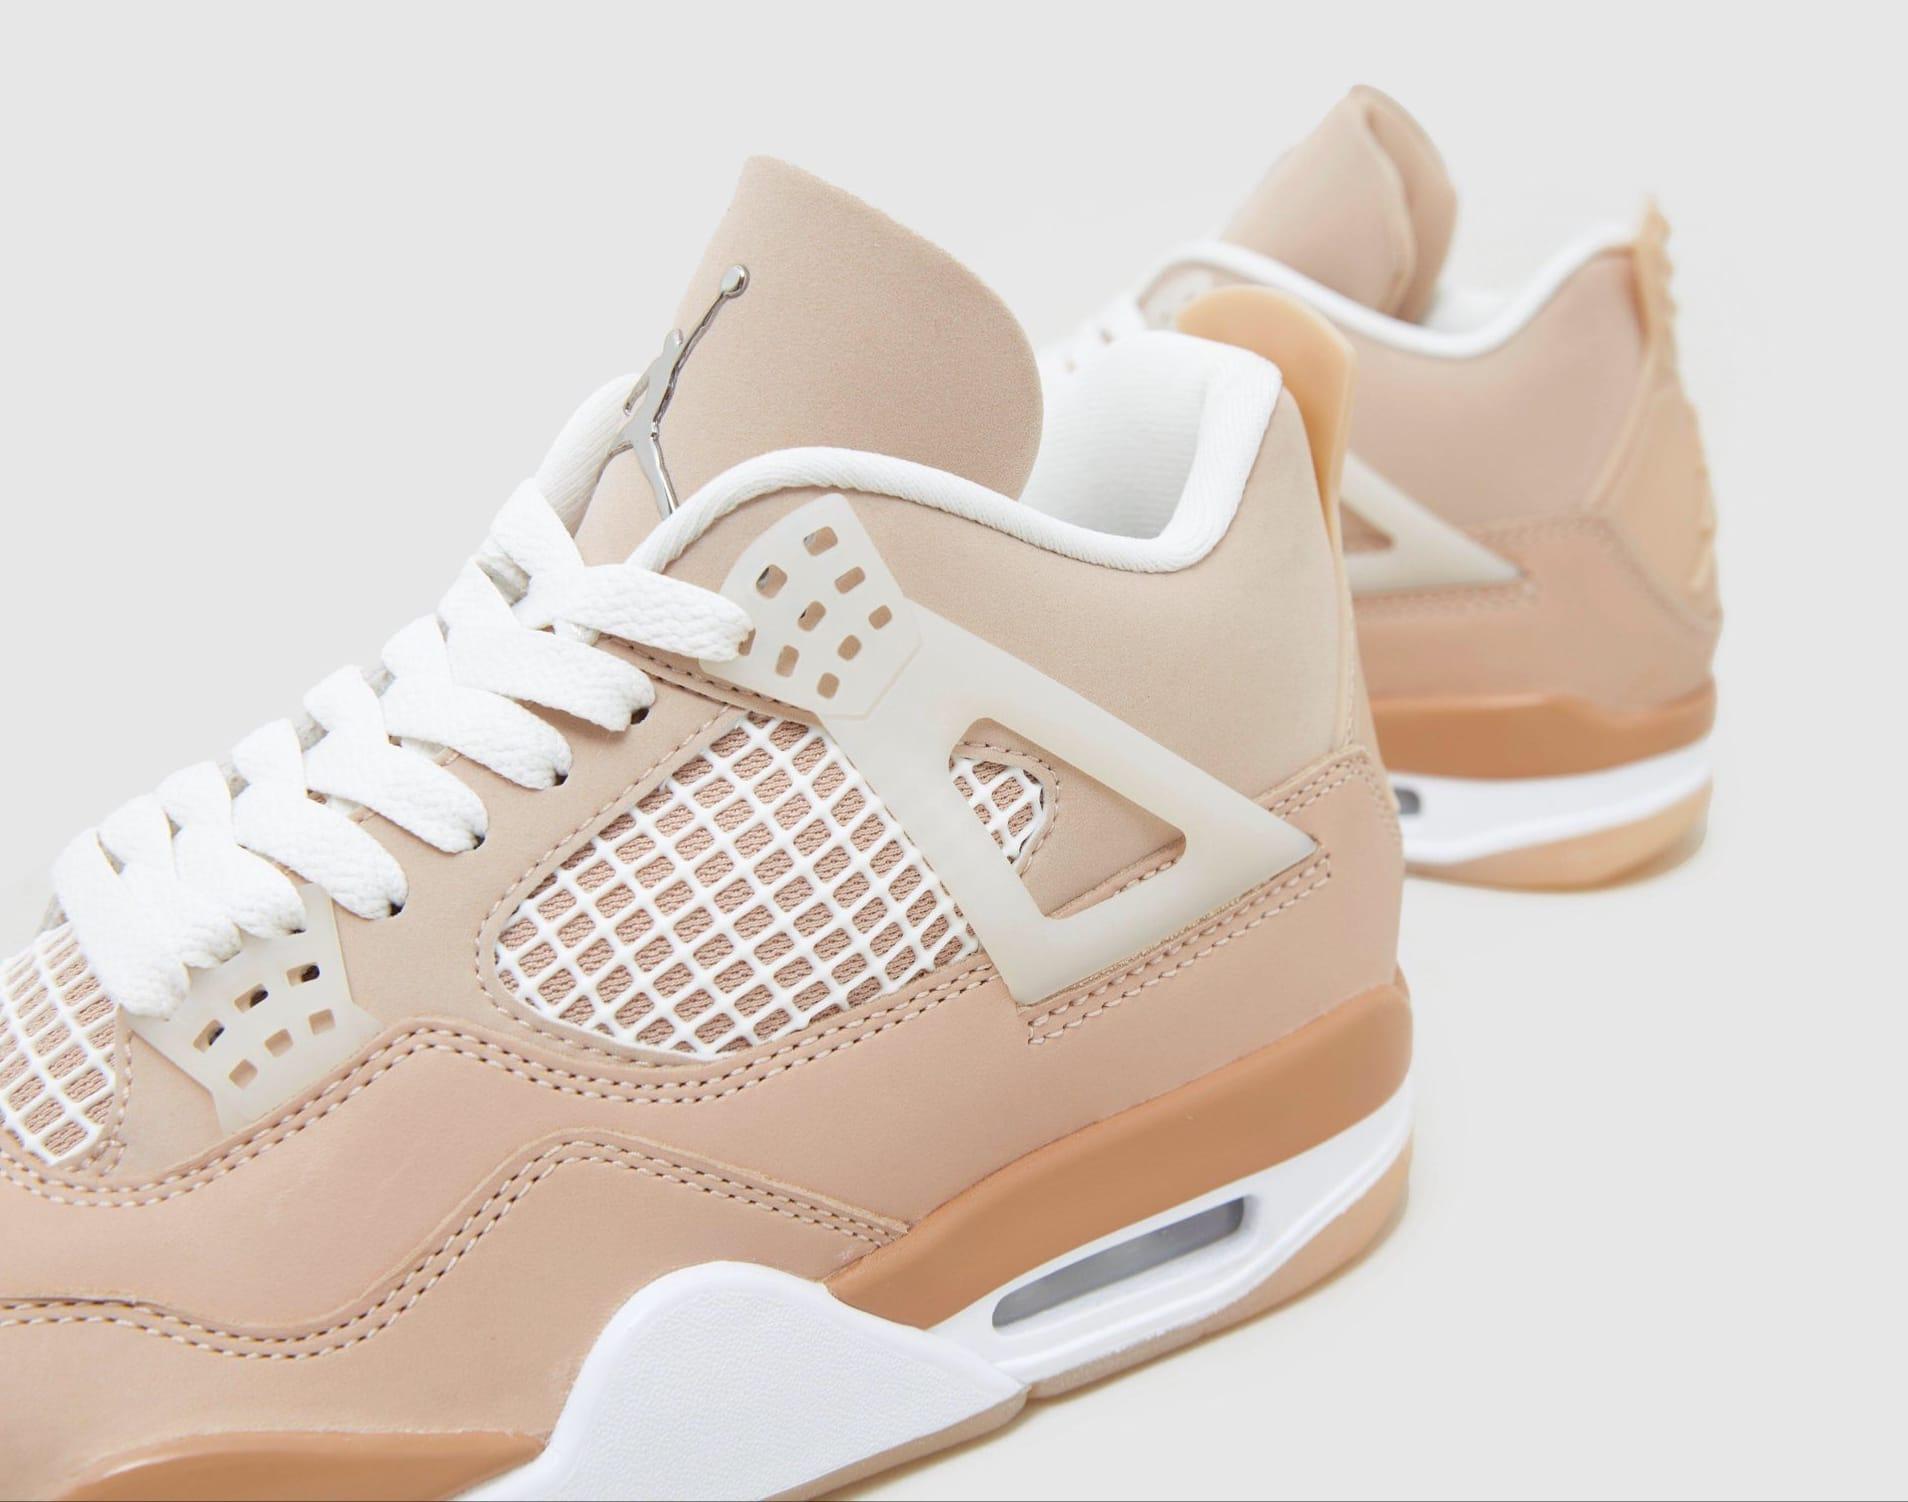 Air Jordan 4 Women's 'Shimmer' DJ0675-200 Side